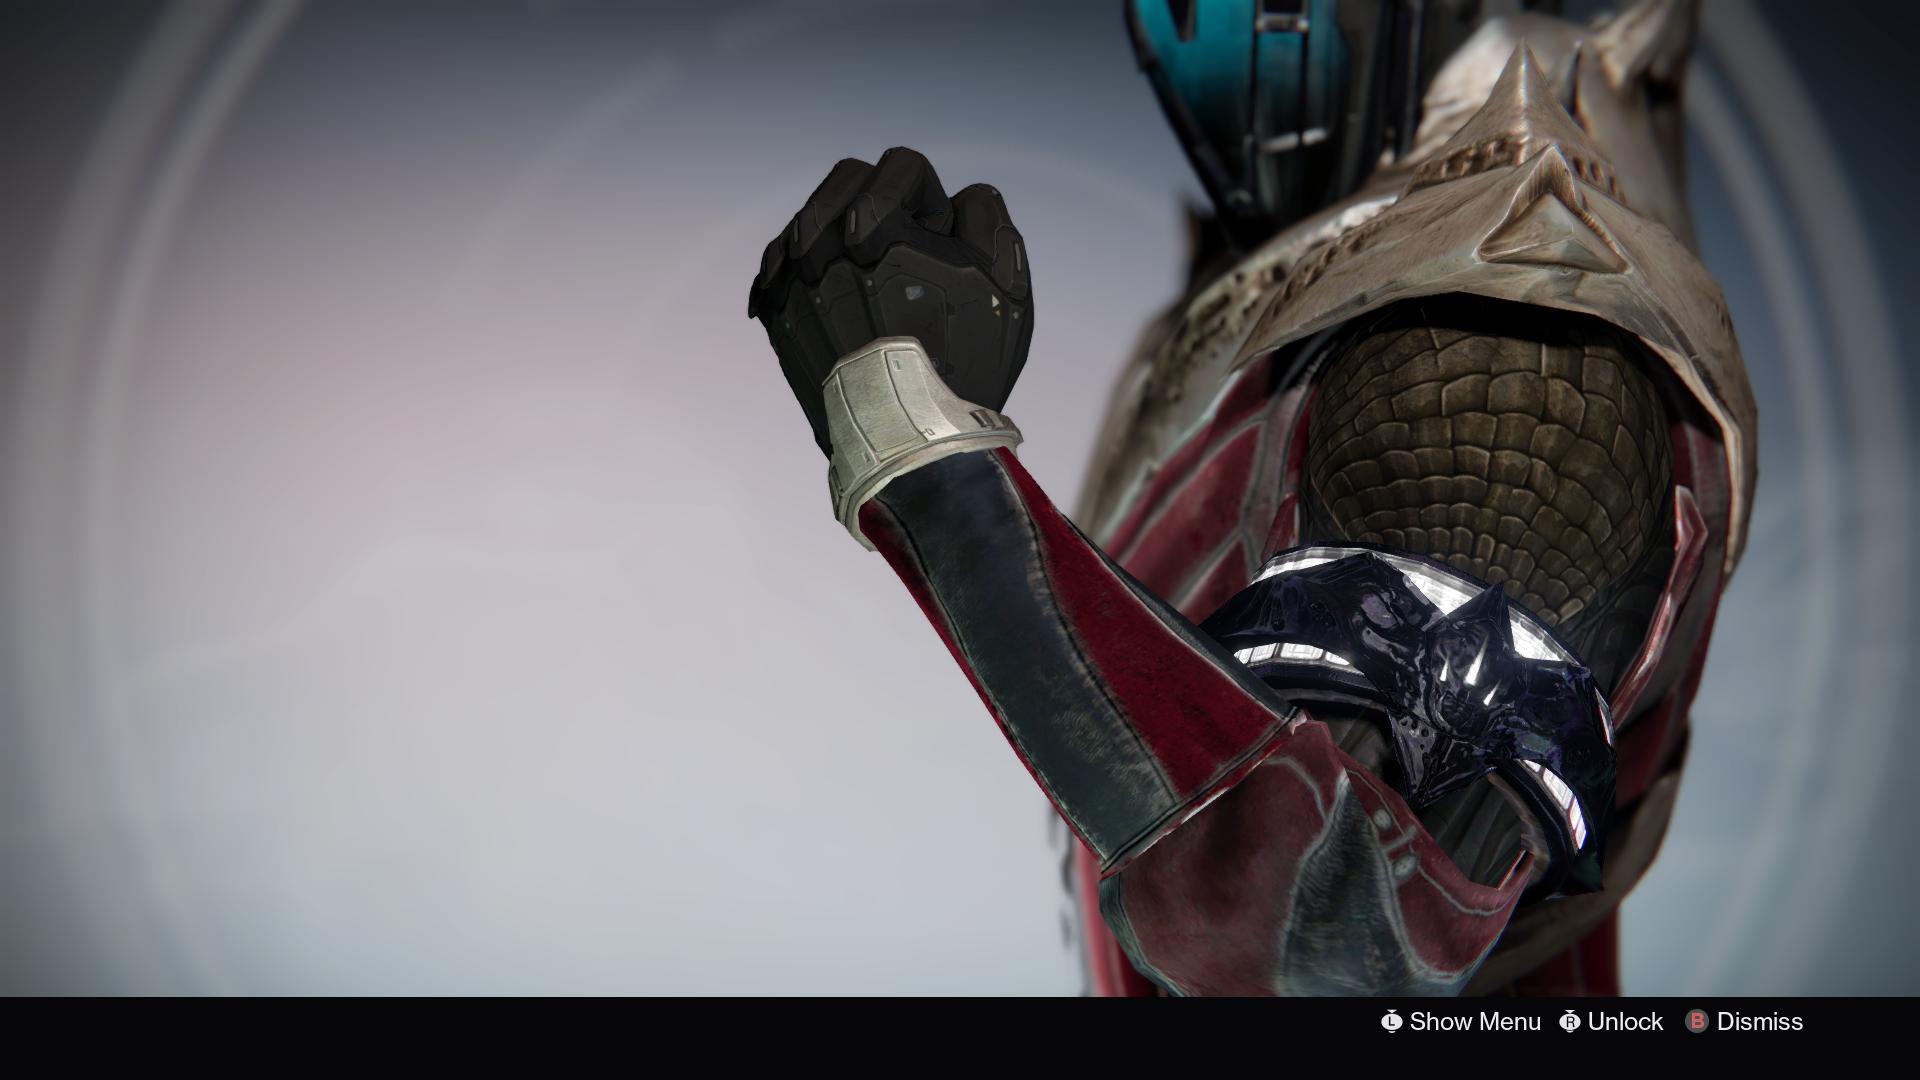 Category:King's Fall Warlock Armor | Destiny Wiki | FANDOM